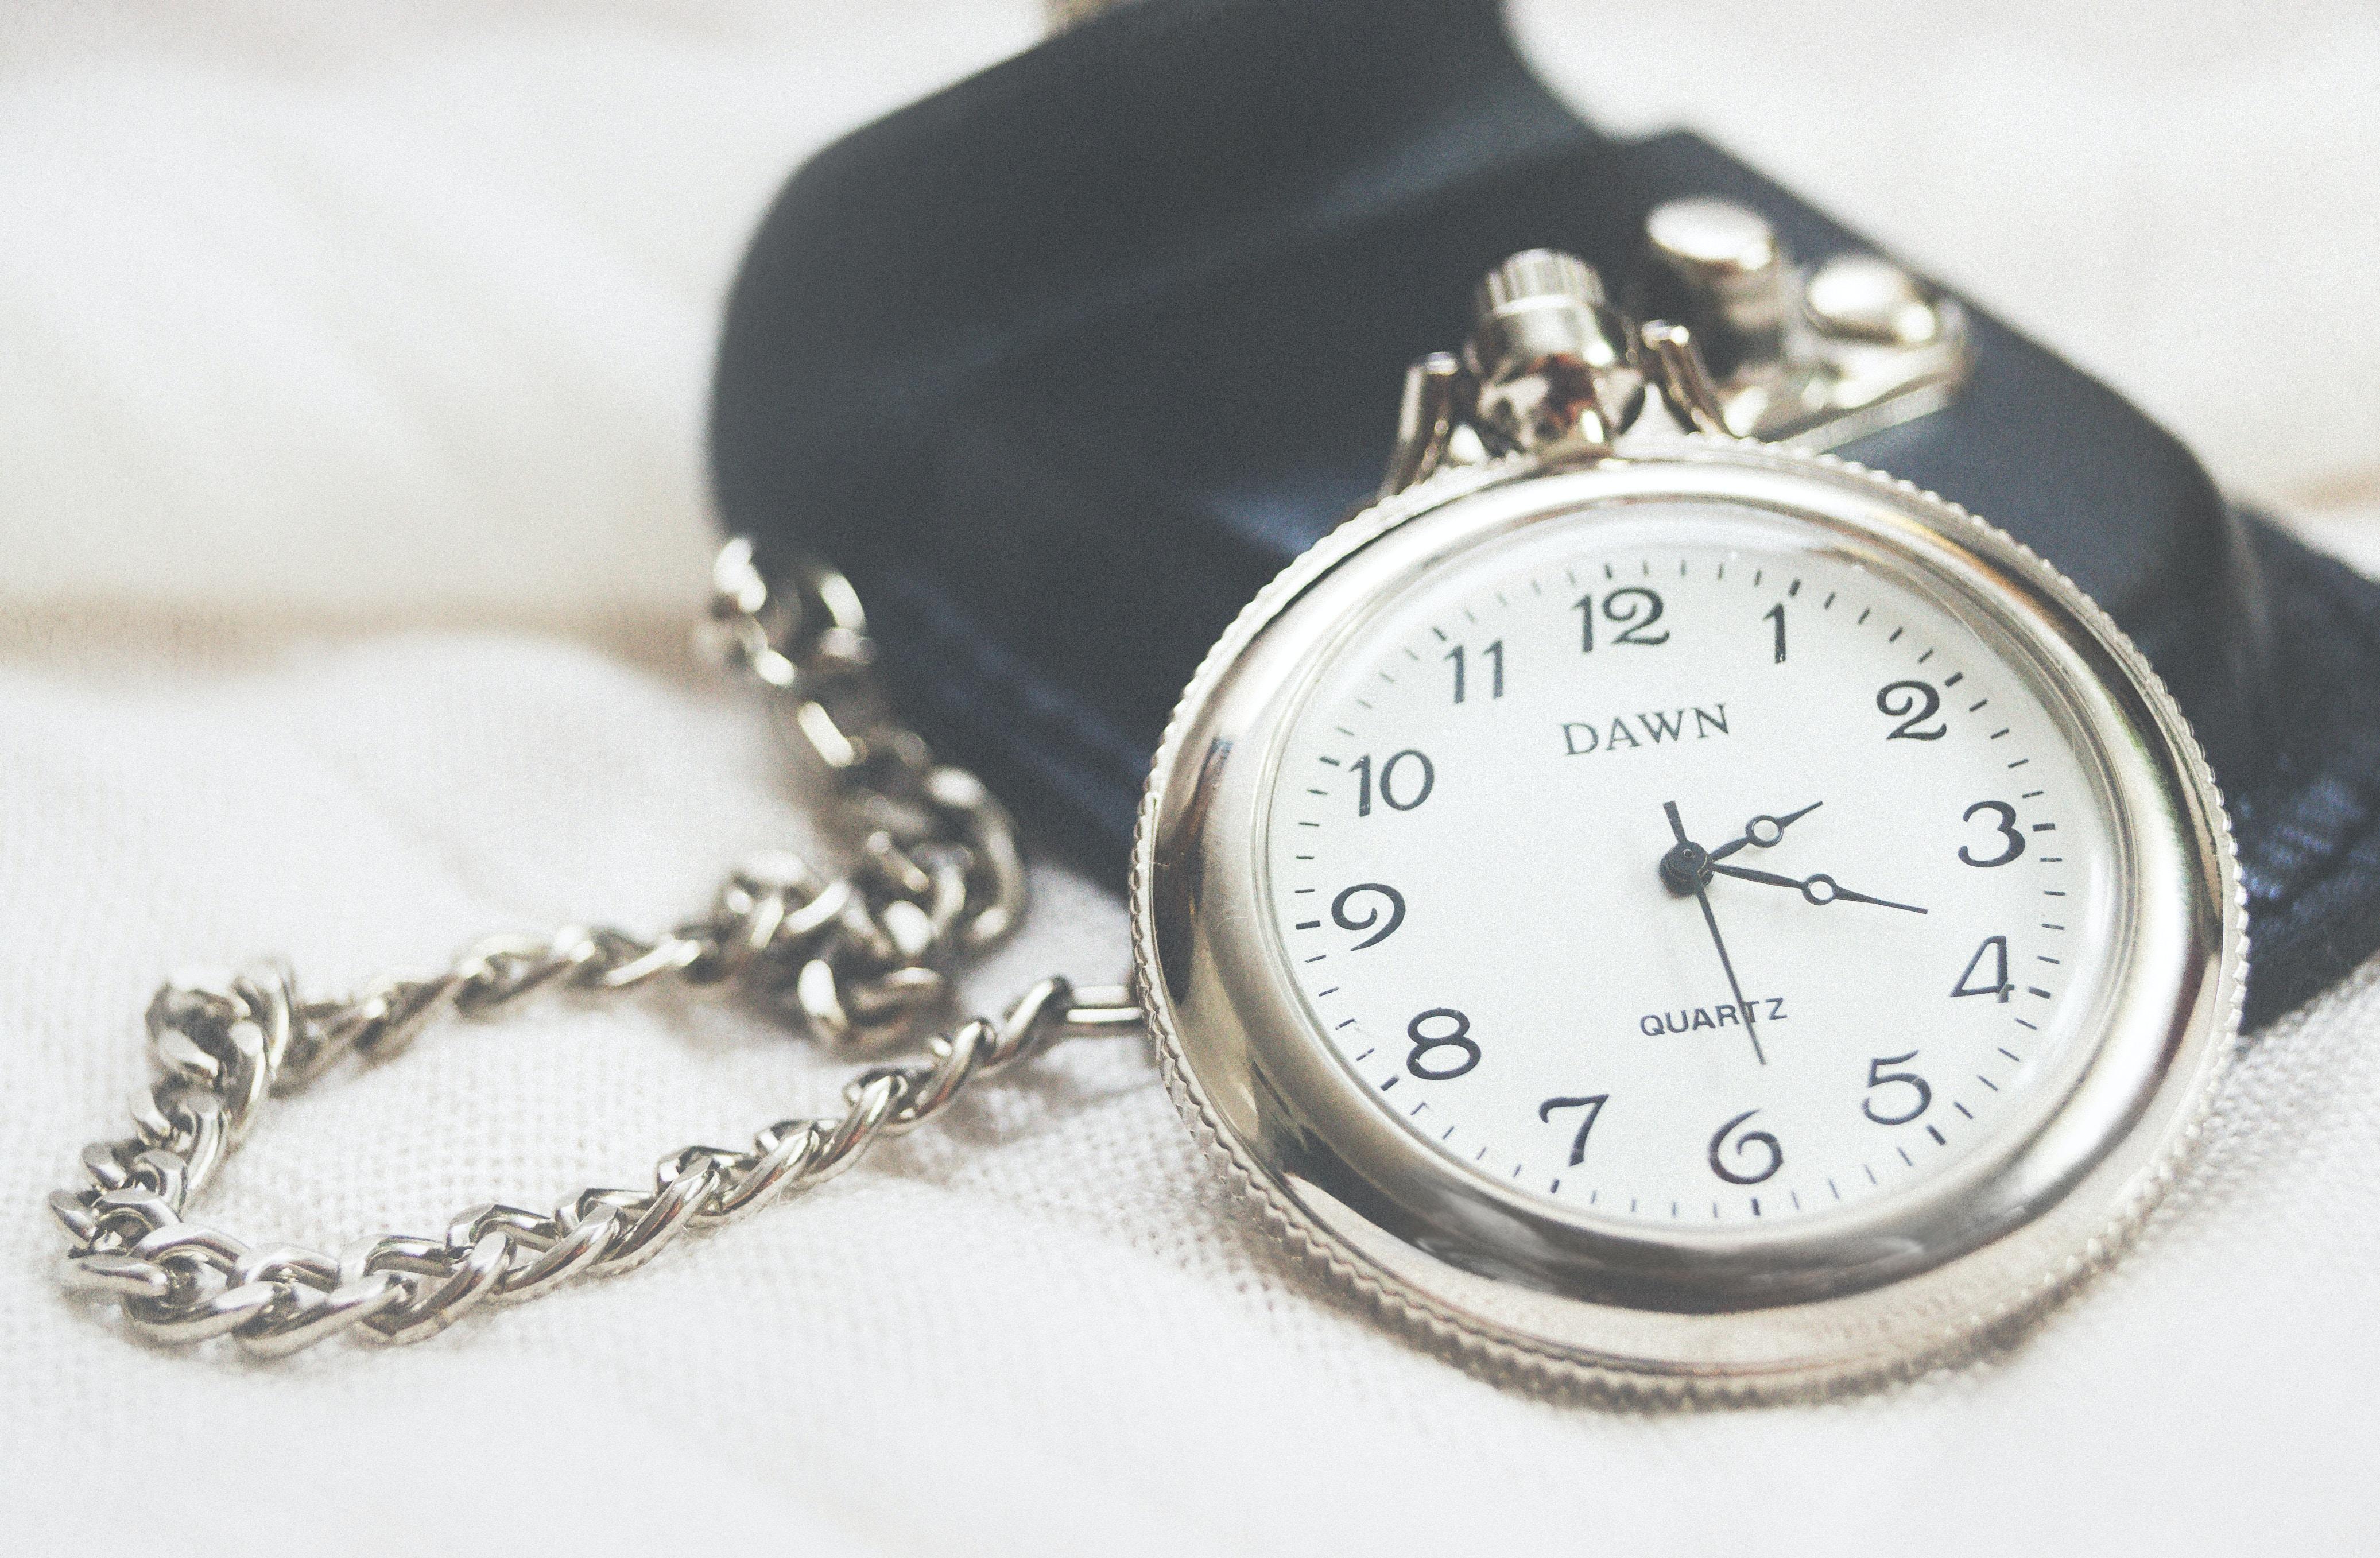 Close-up of a Dawn pocket watch